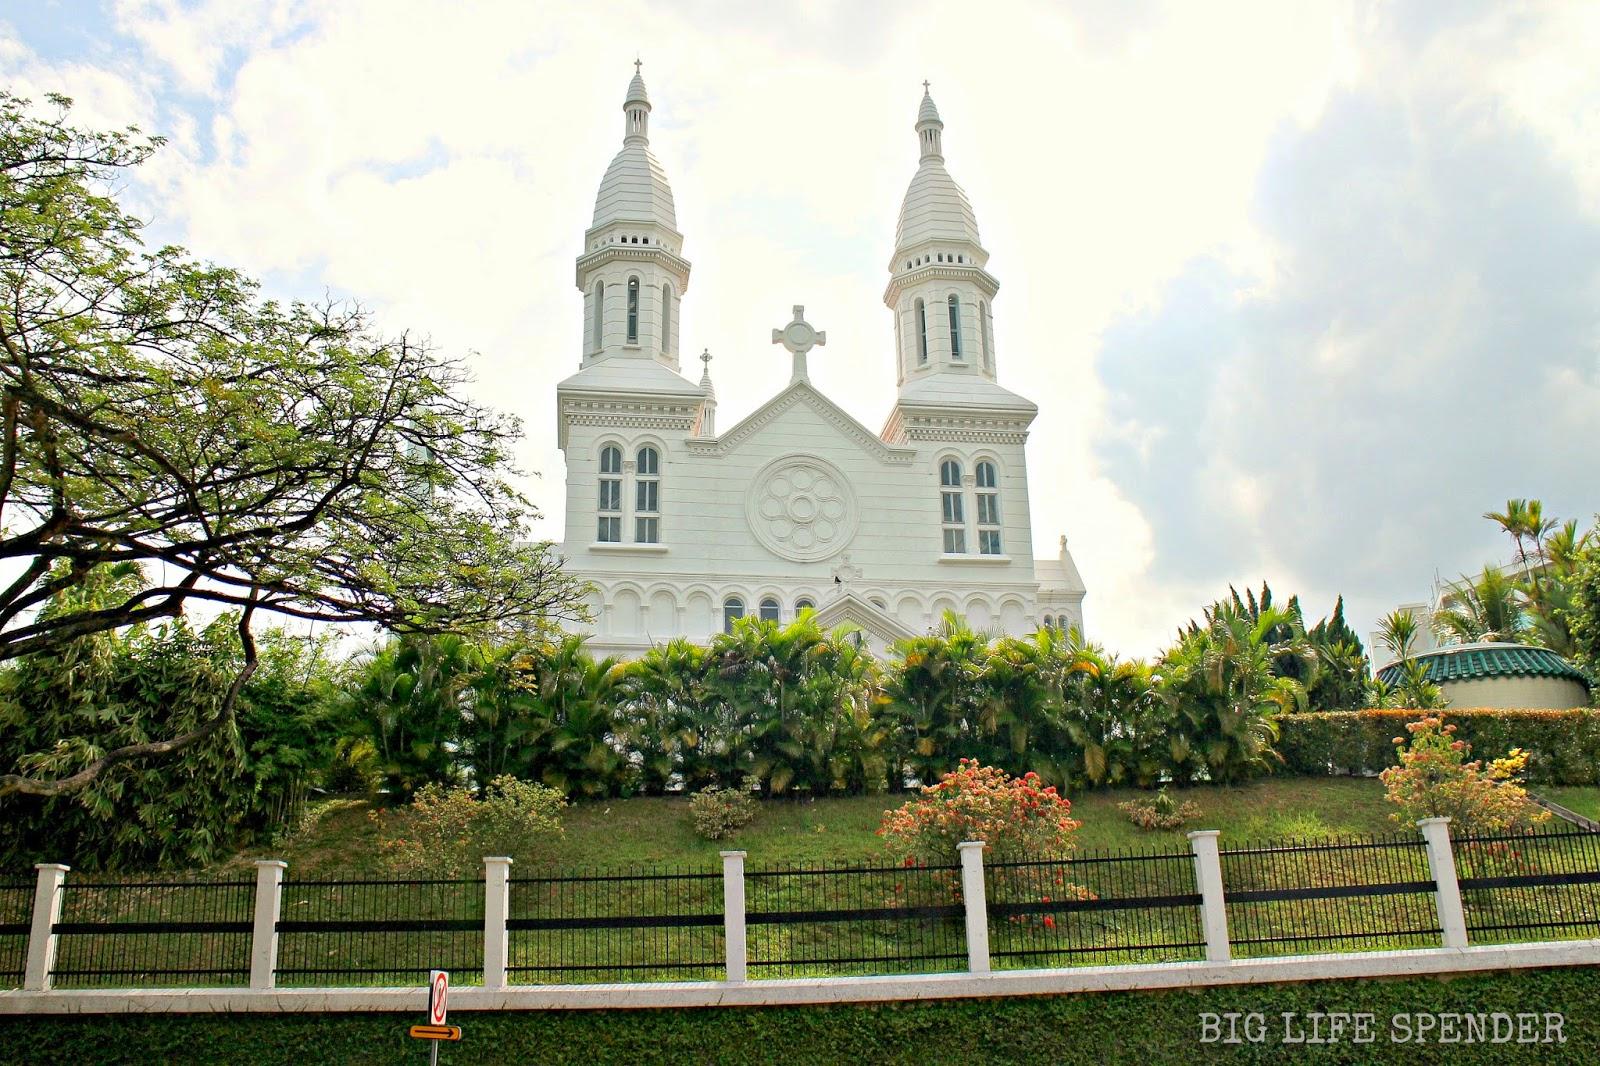 BIG LIFE SPENDER: MY TOP SCENIC CATHOLIC CHURCHES IN SINGAPORE